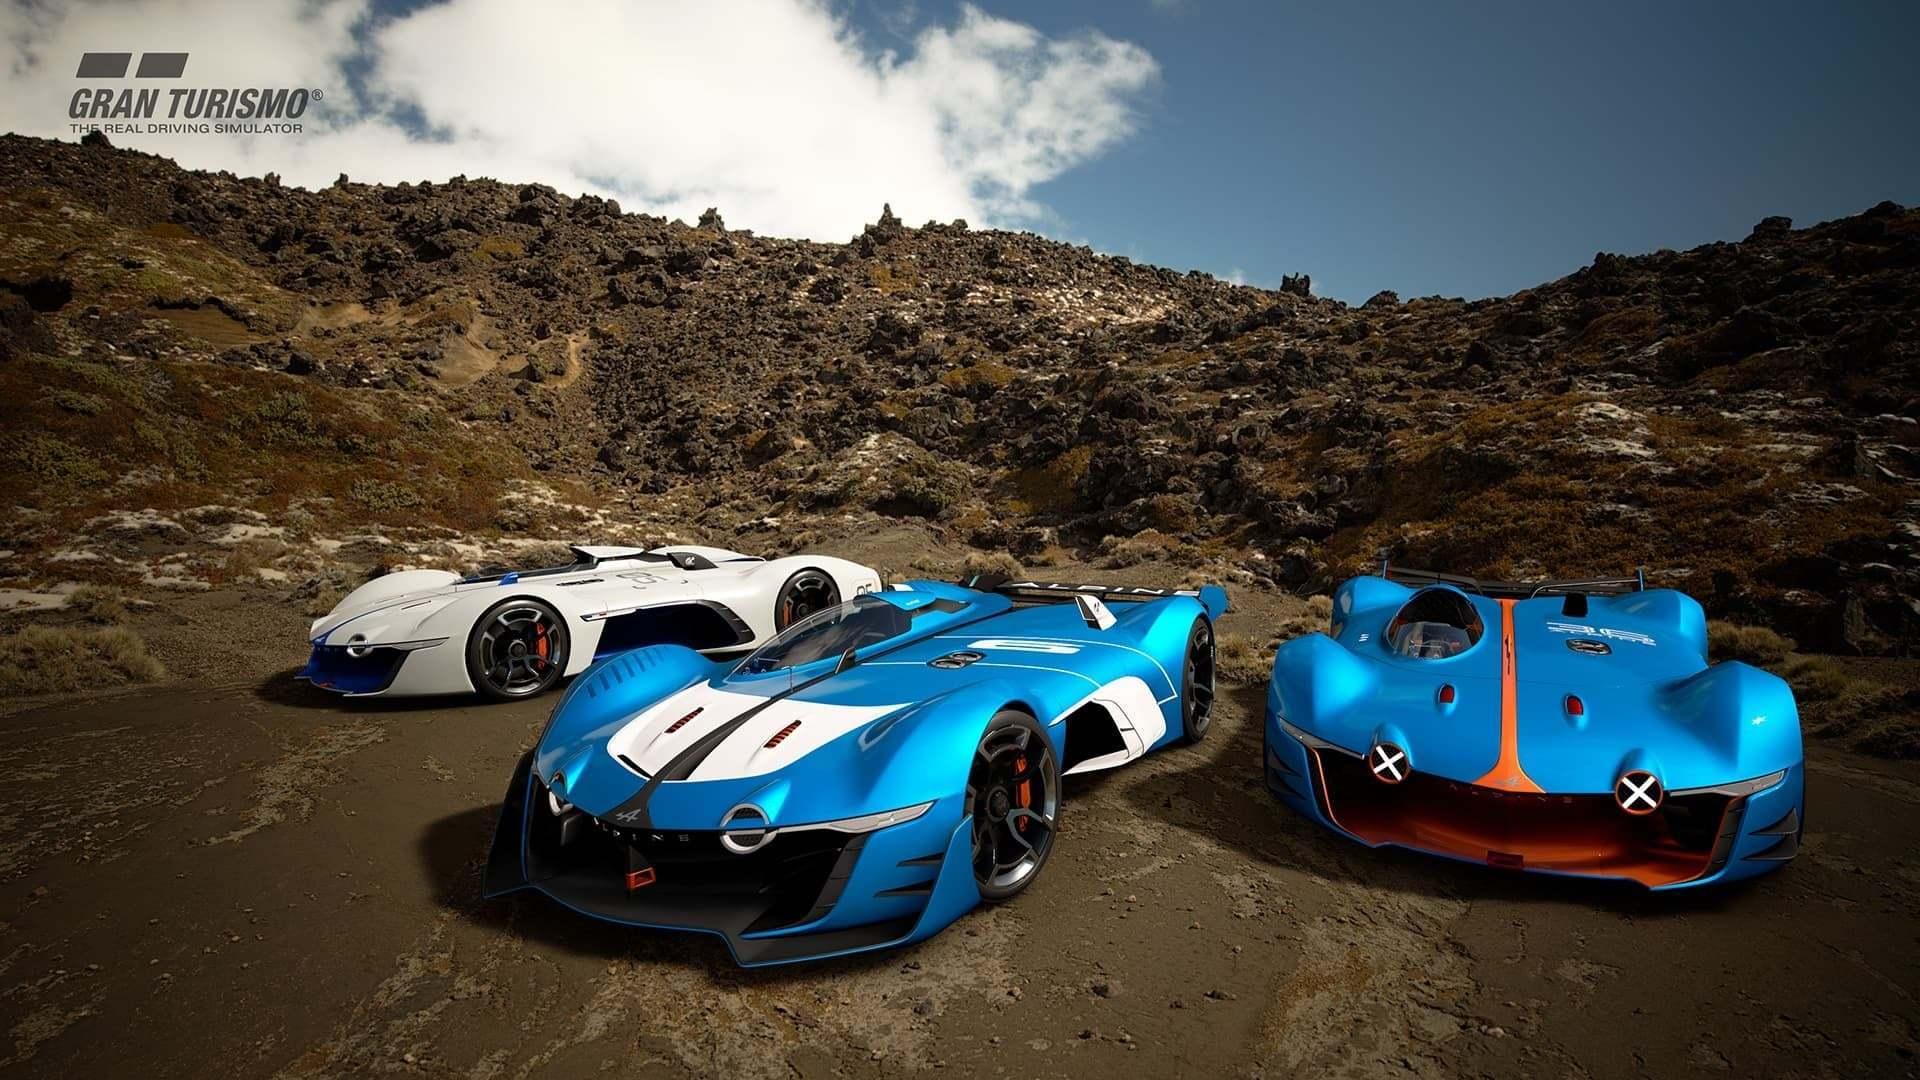 Alpine Vision Gran Turismo GR.1 Sport PS4 - 2